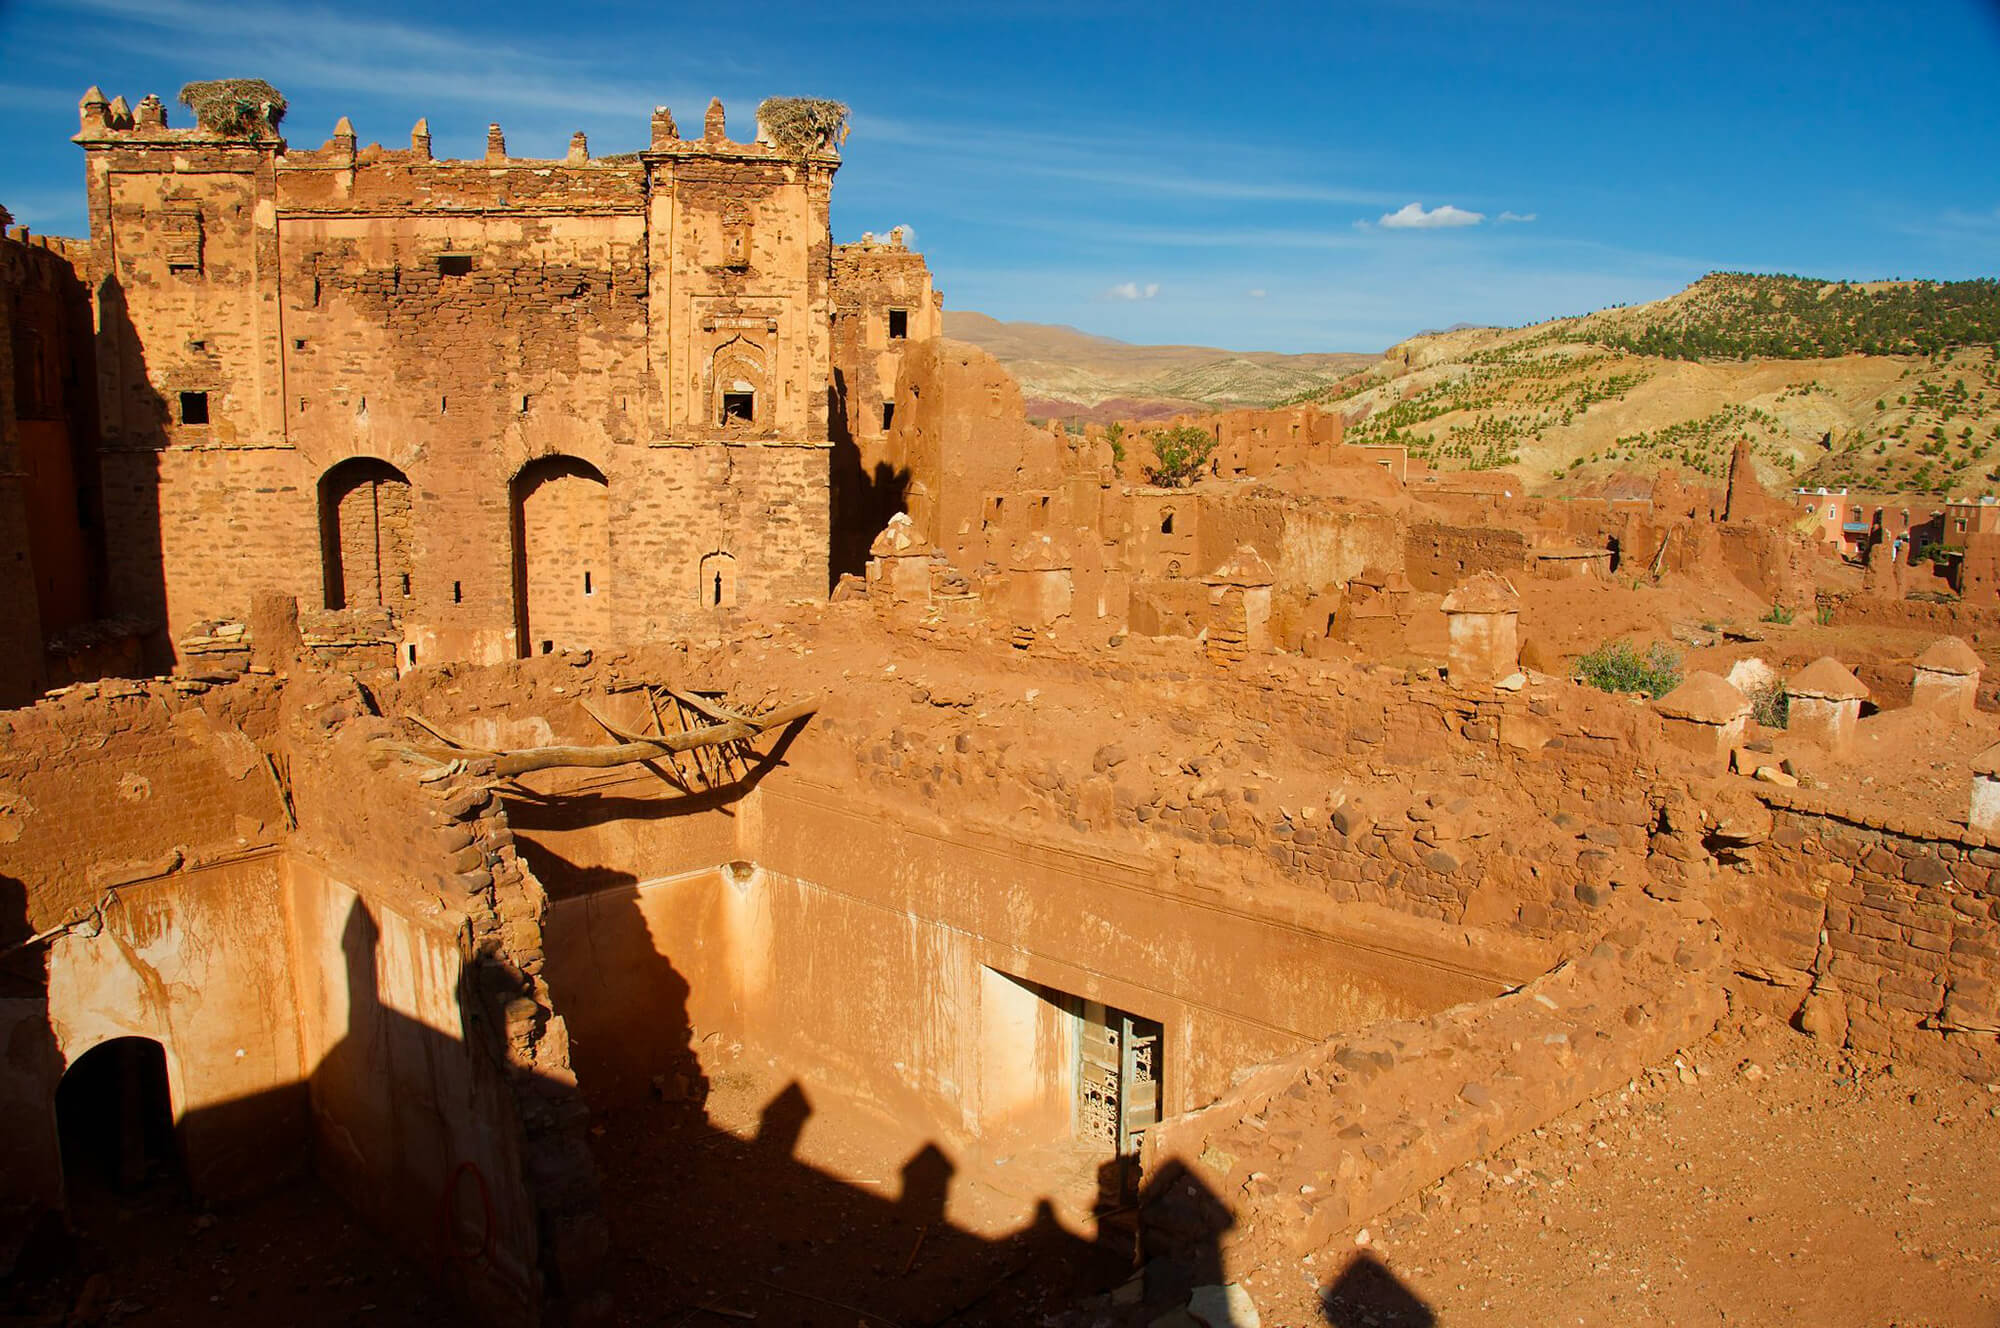 Sahara Desert Tour - Small Moroccan Towns Worth Exploring - Demnate Kasbah de Telouet